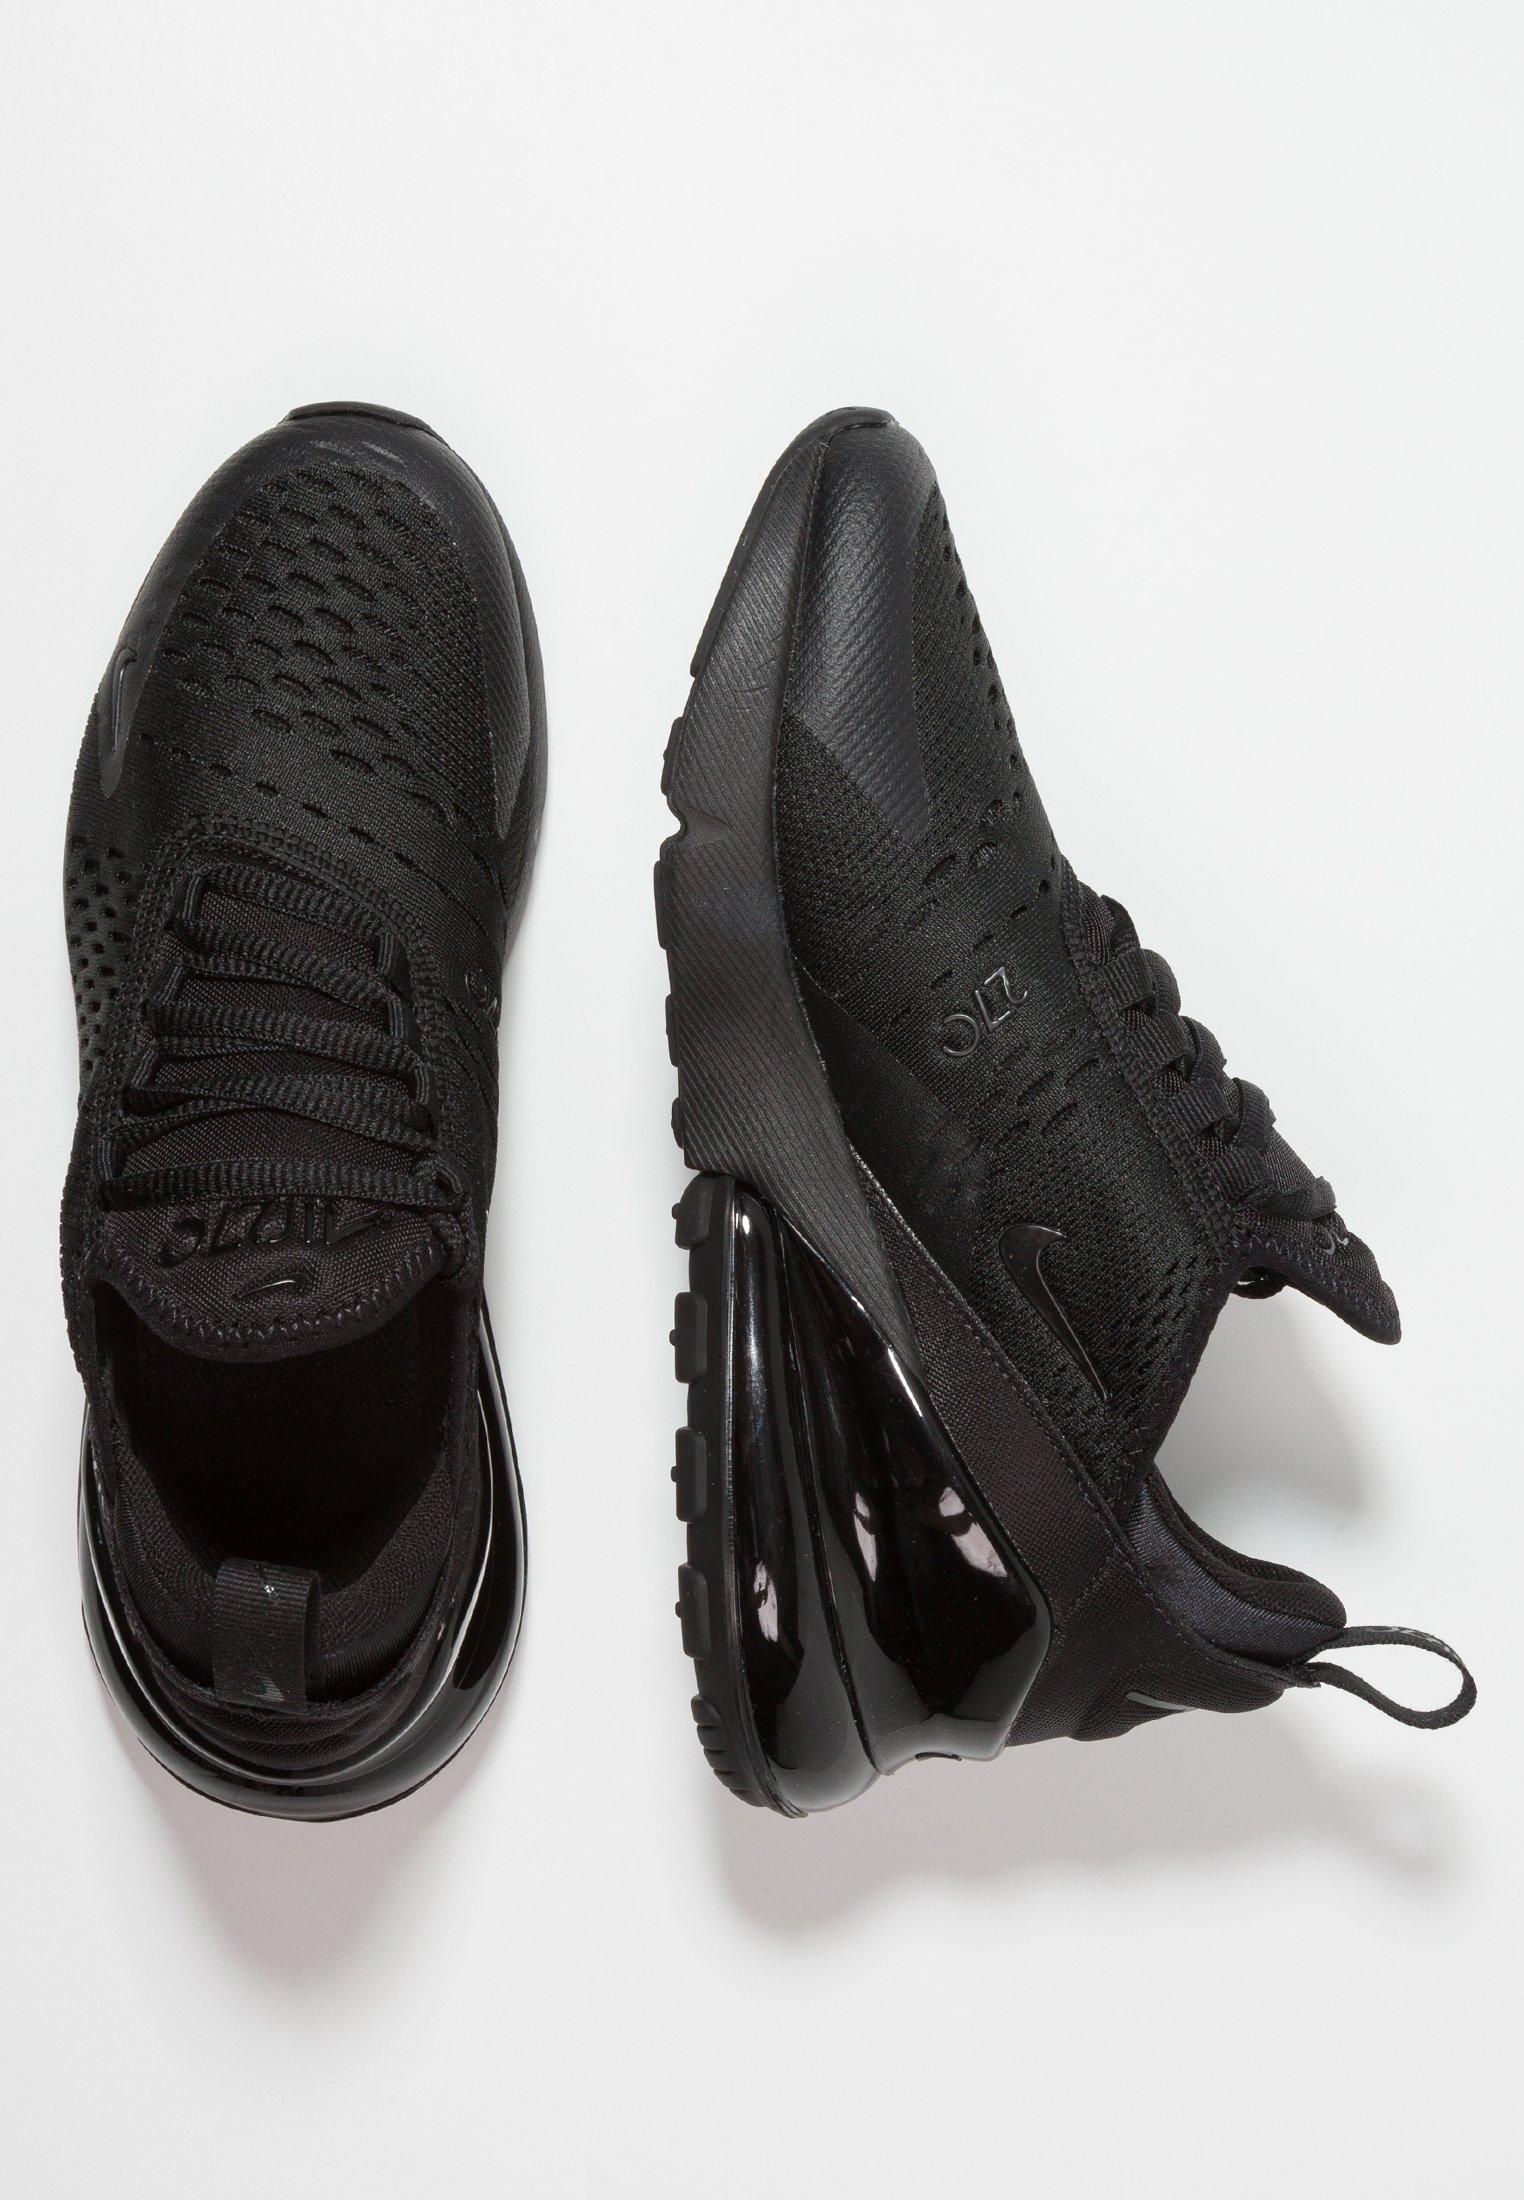 difícil de complacer enfermero Grave  Nike Sportswear AIR MAX 270 - Trainers - black - Zalando.ie